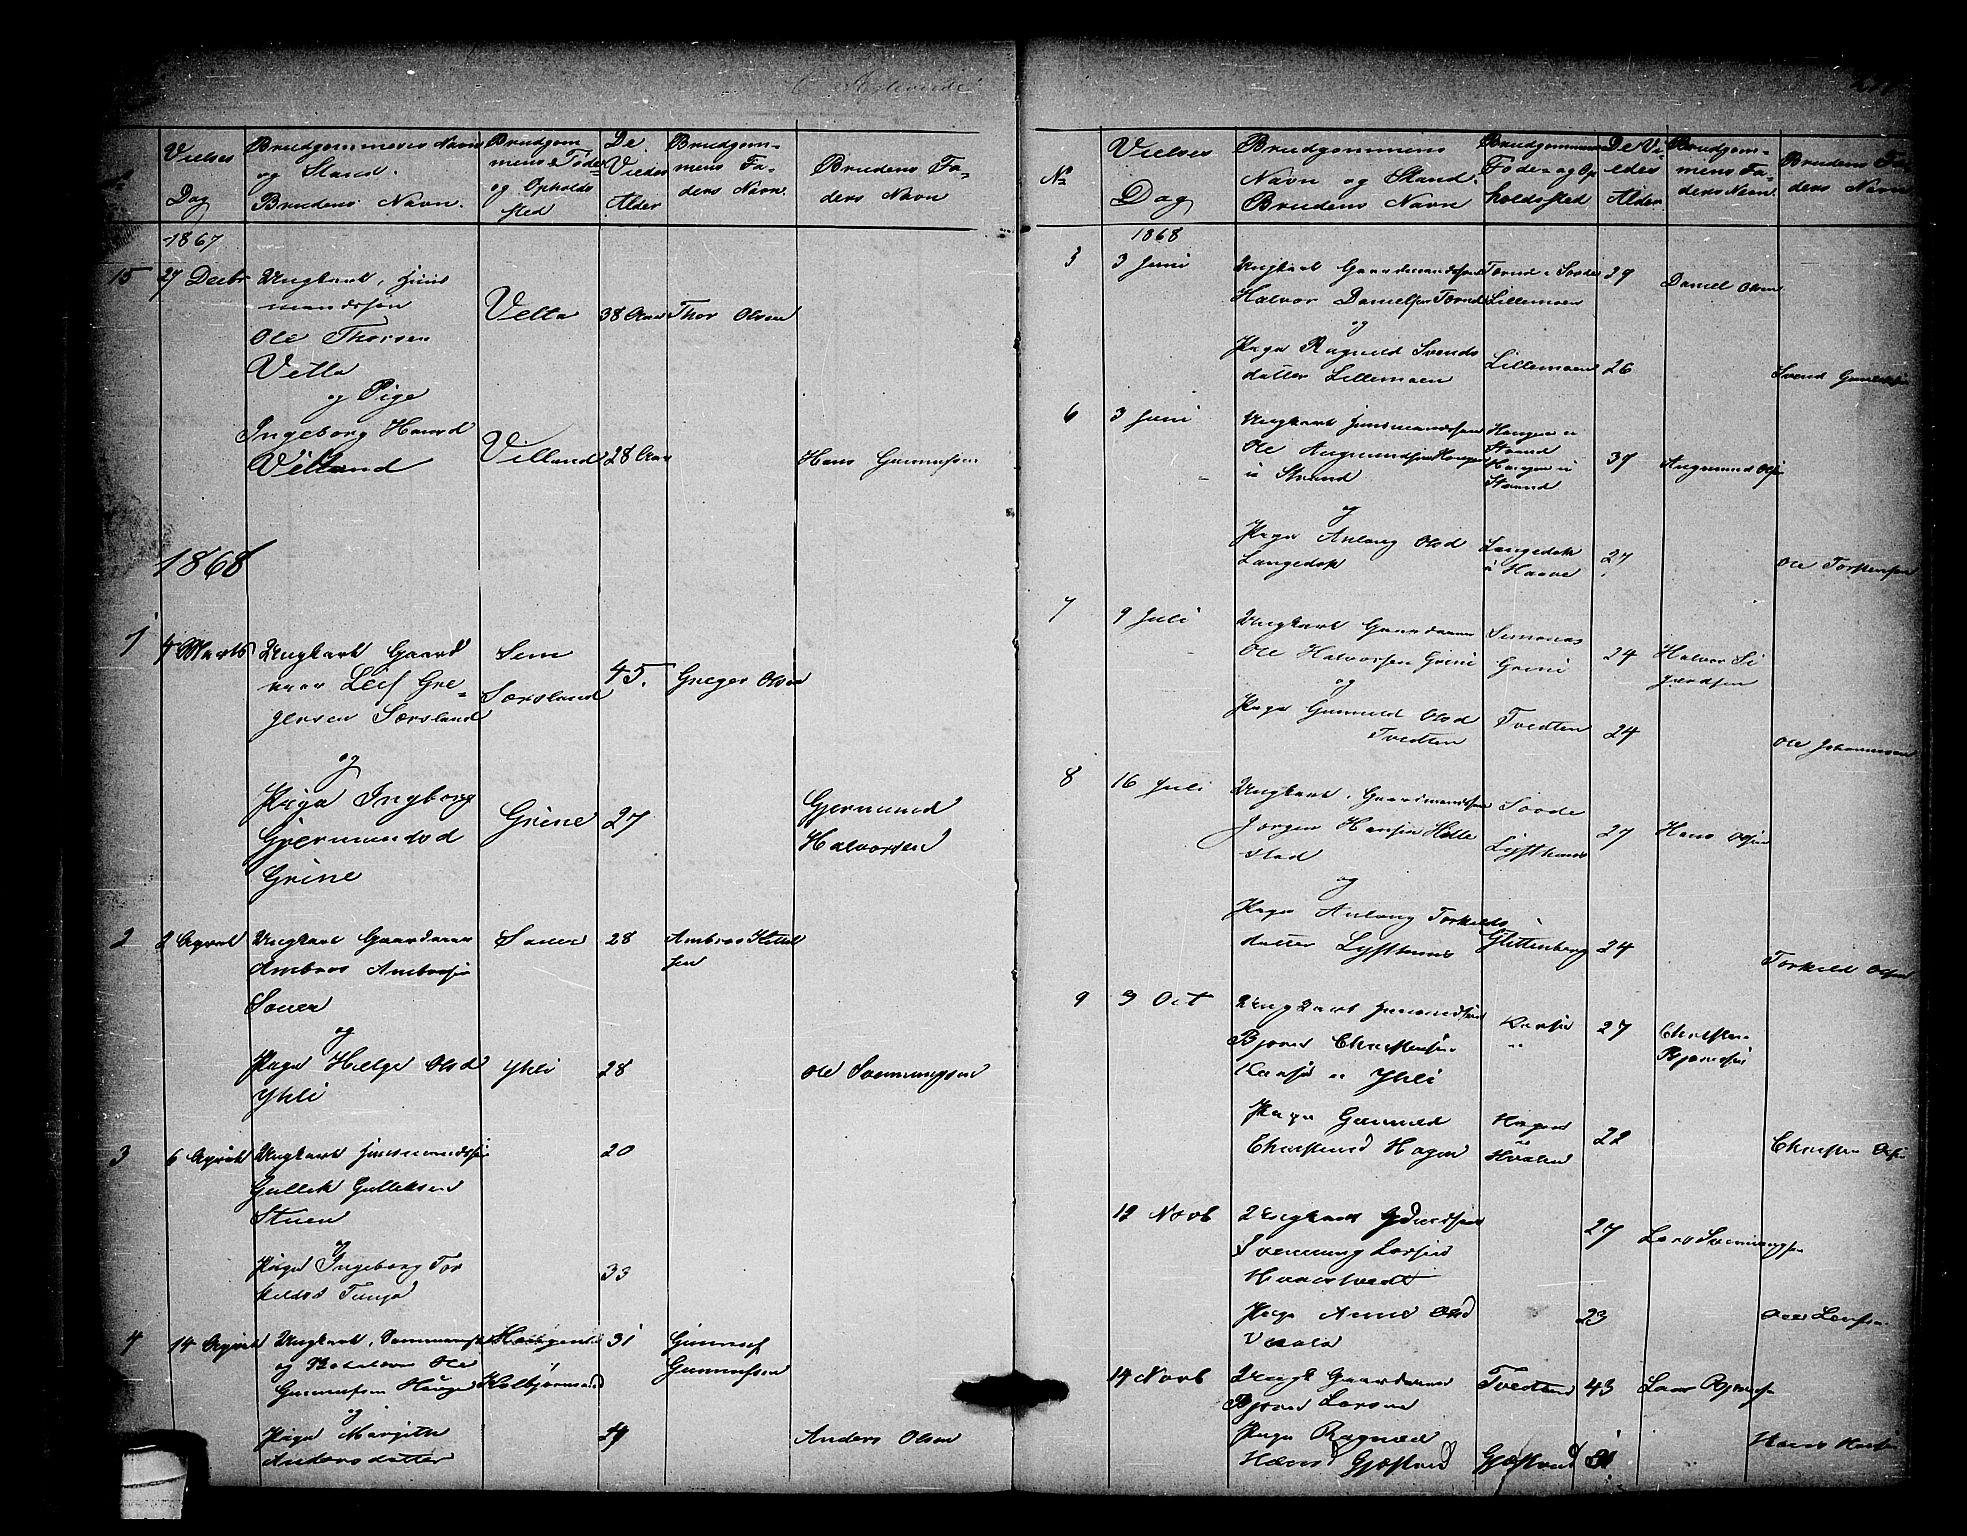 SAKO, Heddal kirkebøker, G/Ga/L0001: Klokkerbok nr. I 1, 1866-1878, s. 298-299